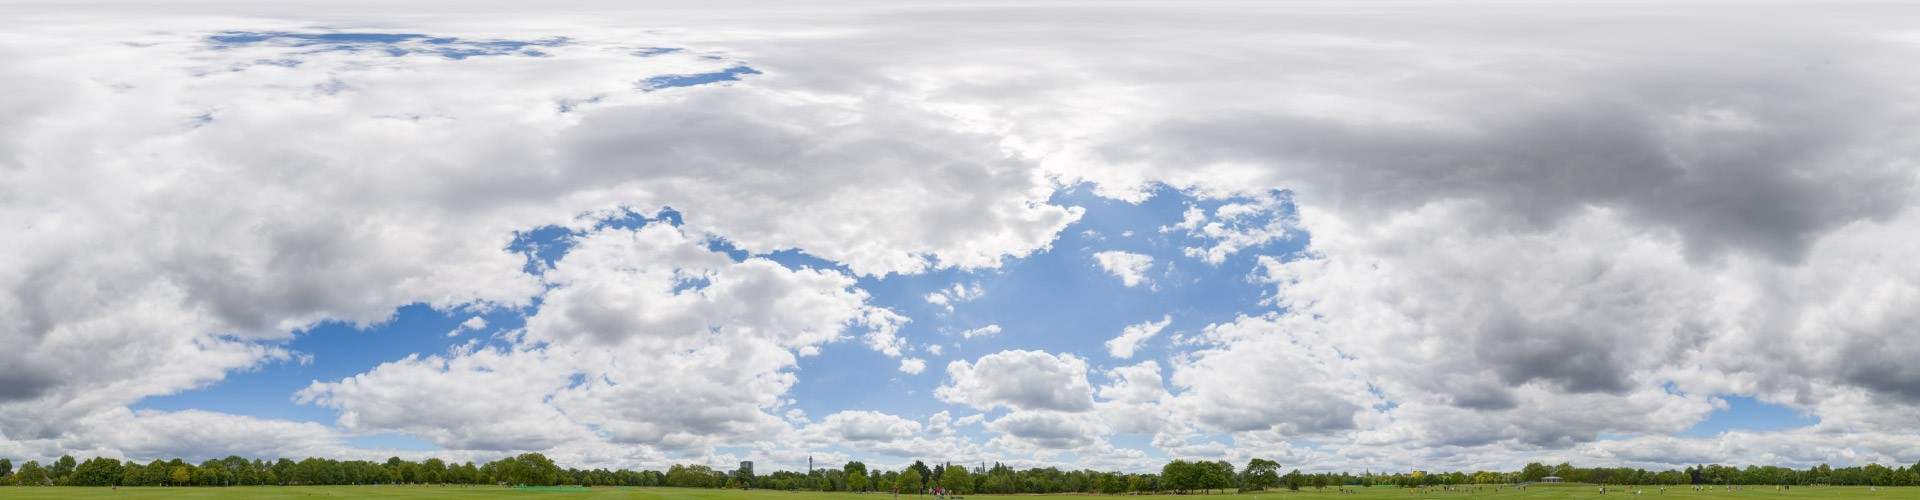 Sunny Cloudy 7243 (30k) HDRI